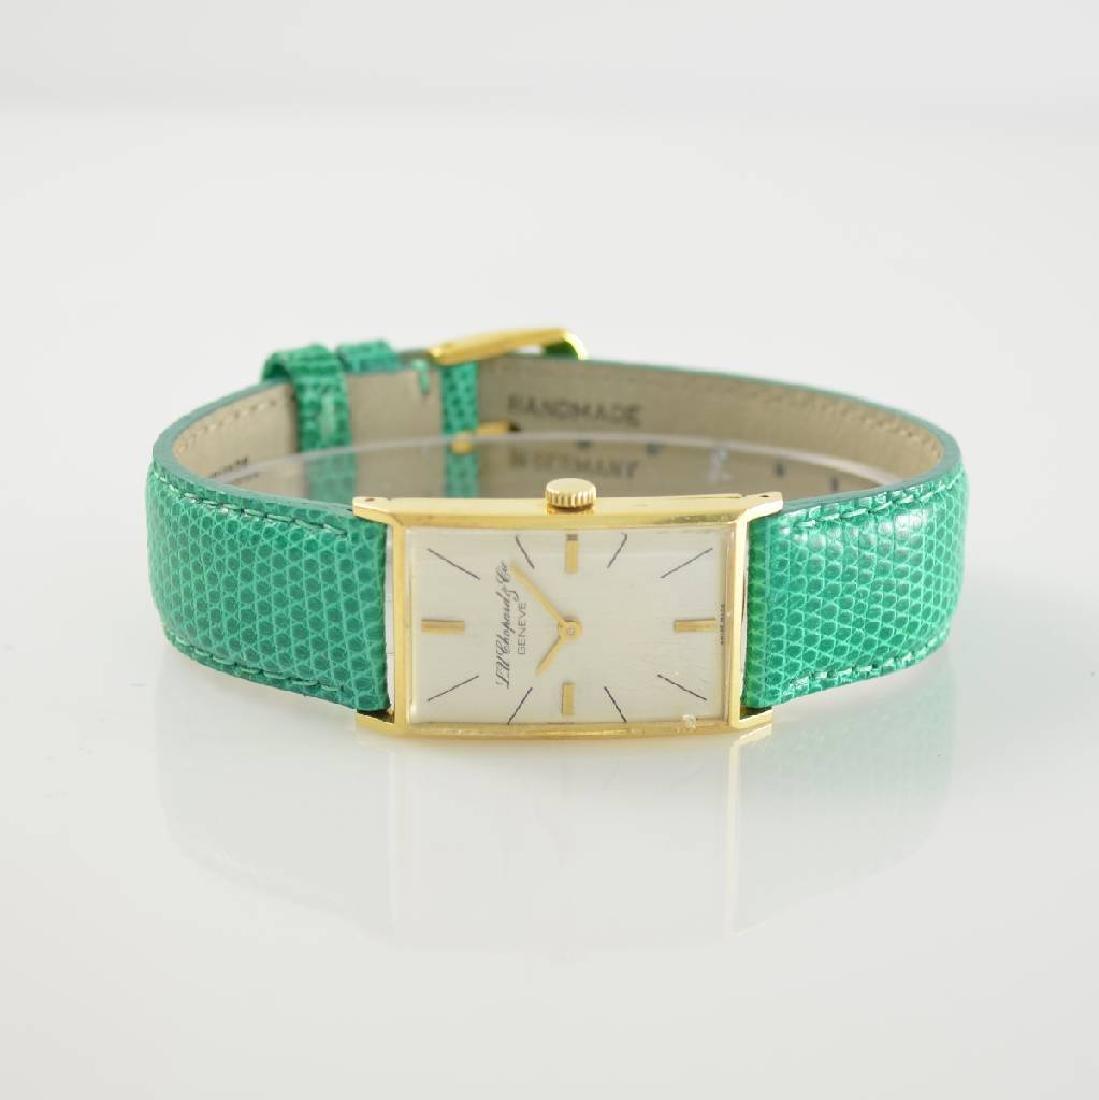 CHOPARD wristwatch in 18k yellow gold